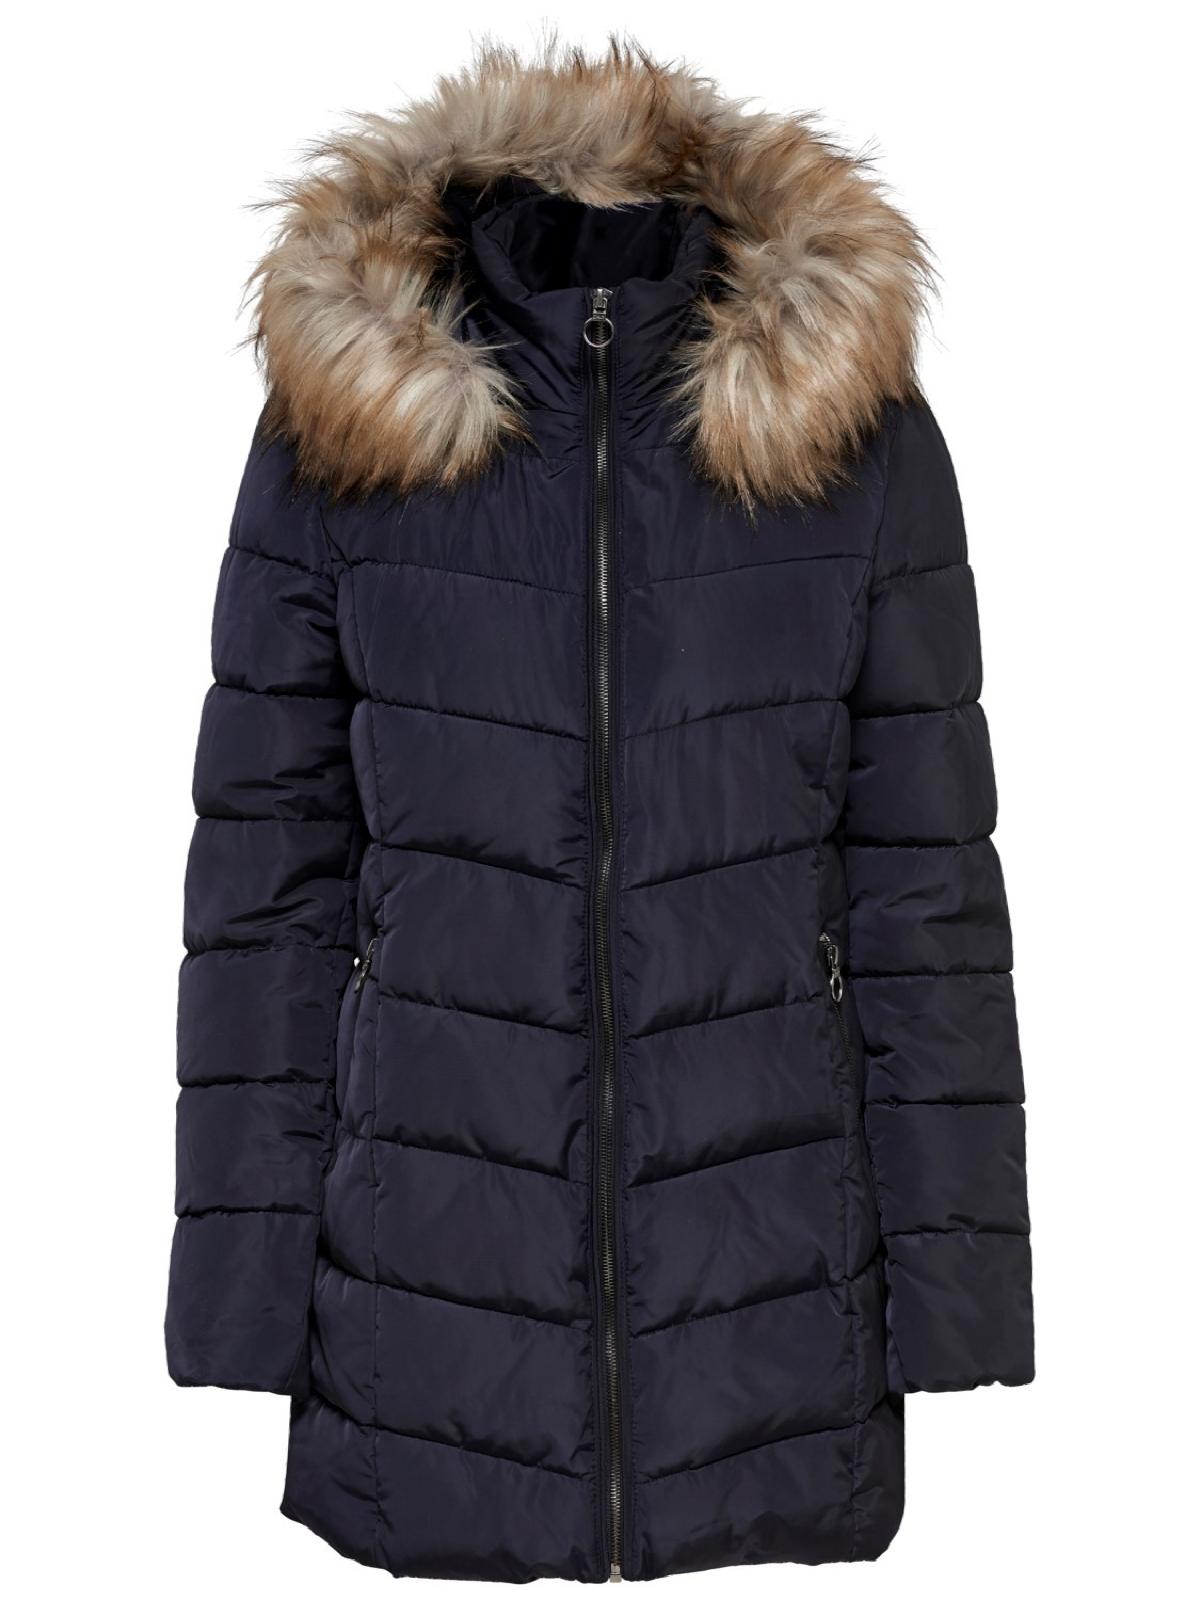 online retailer e3ca9 cfa45 Only Damen Winter Stepp Mantel Parka Jacke Fellkapuze 15168930